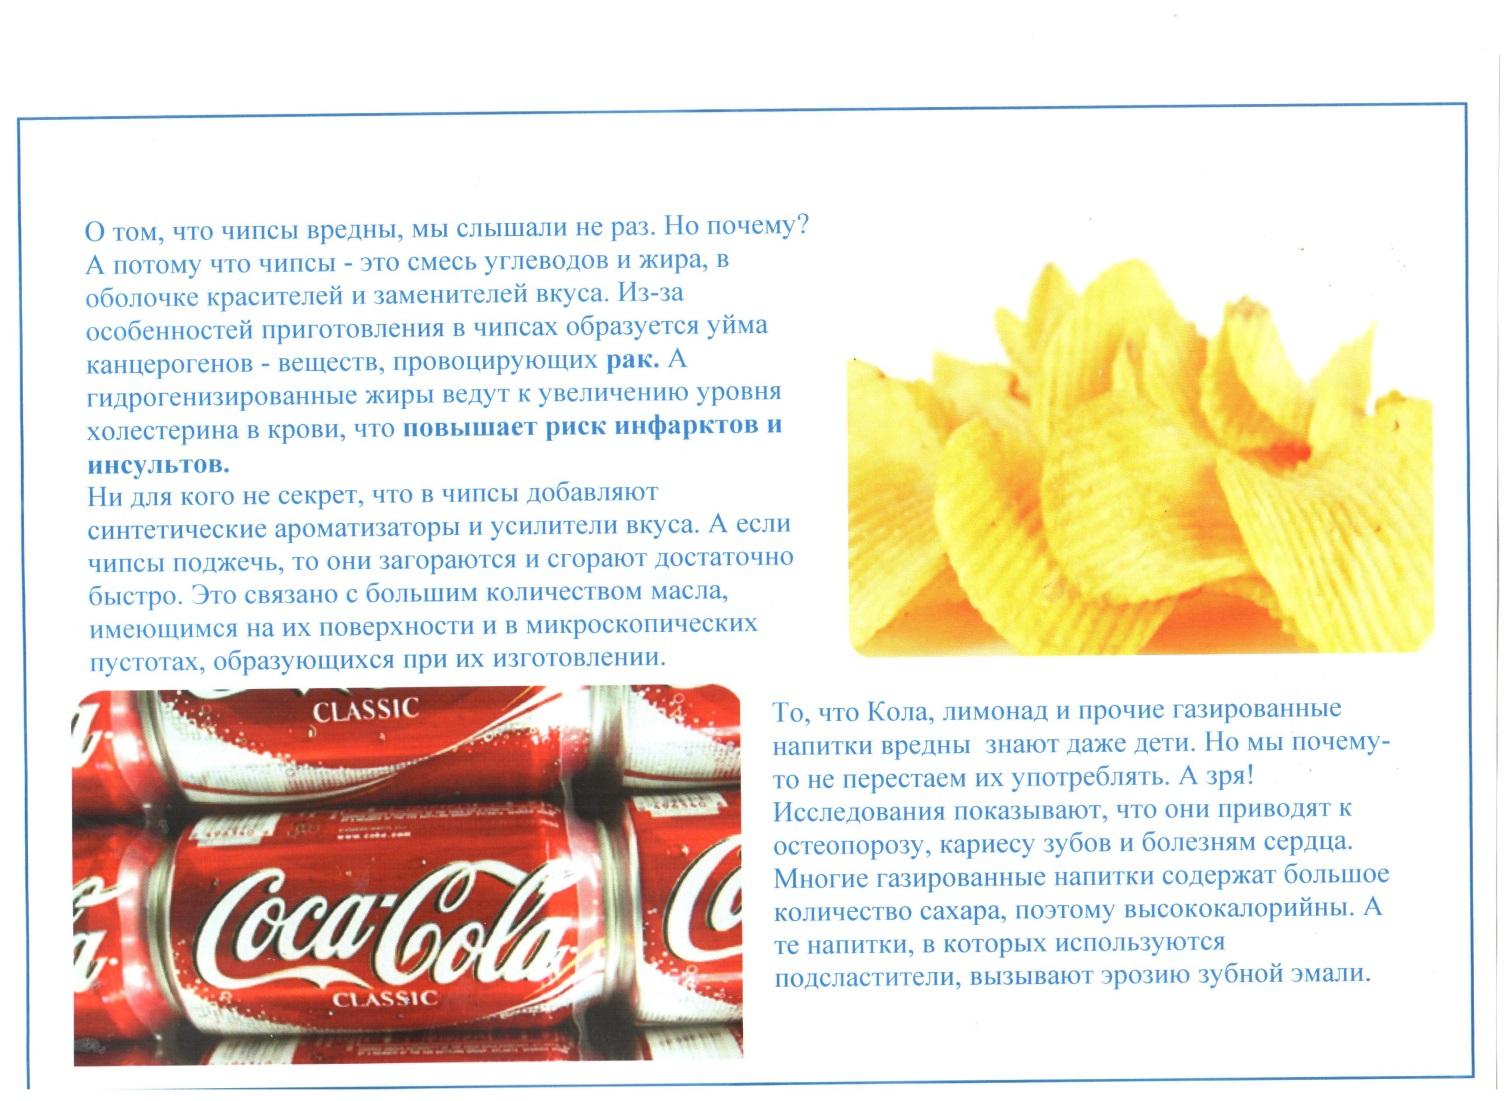 C:\Users\мария\Desktop\постер\2 постер 001.jpg